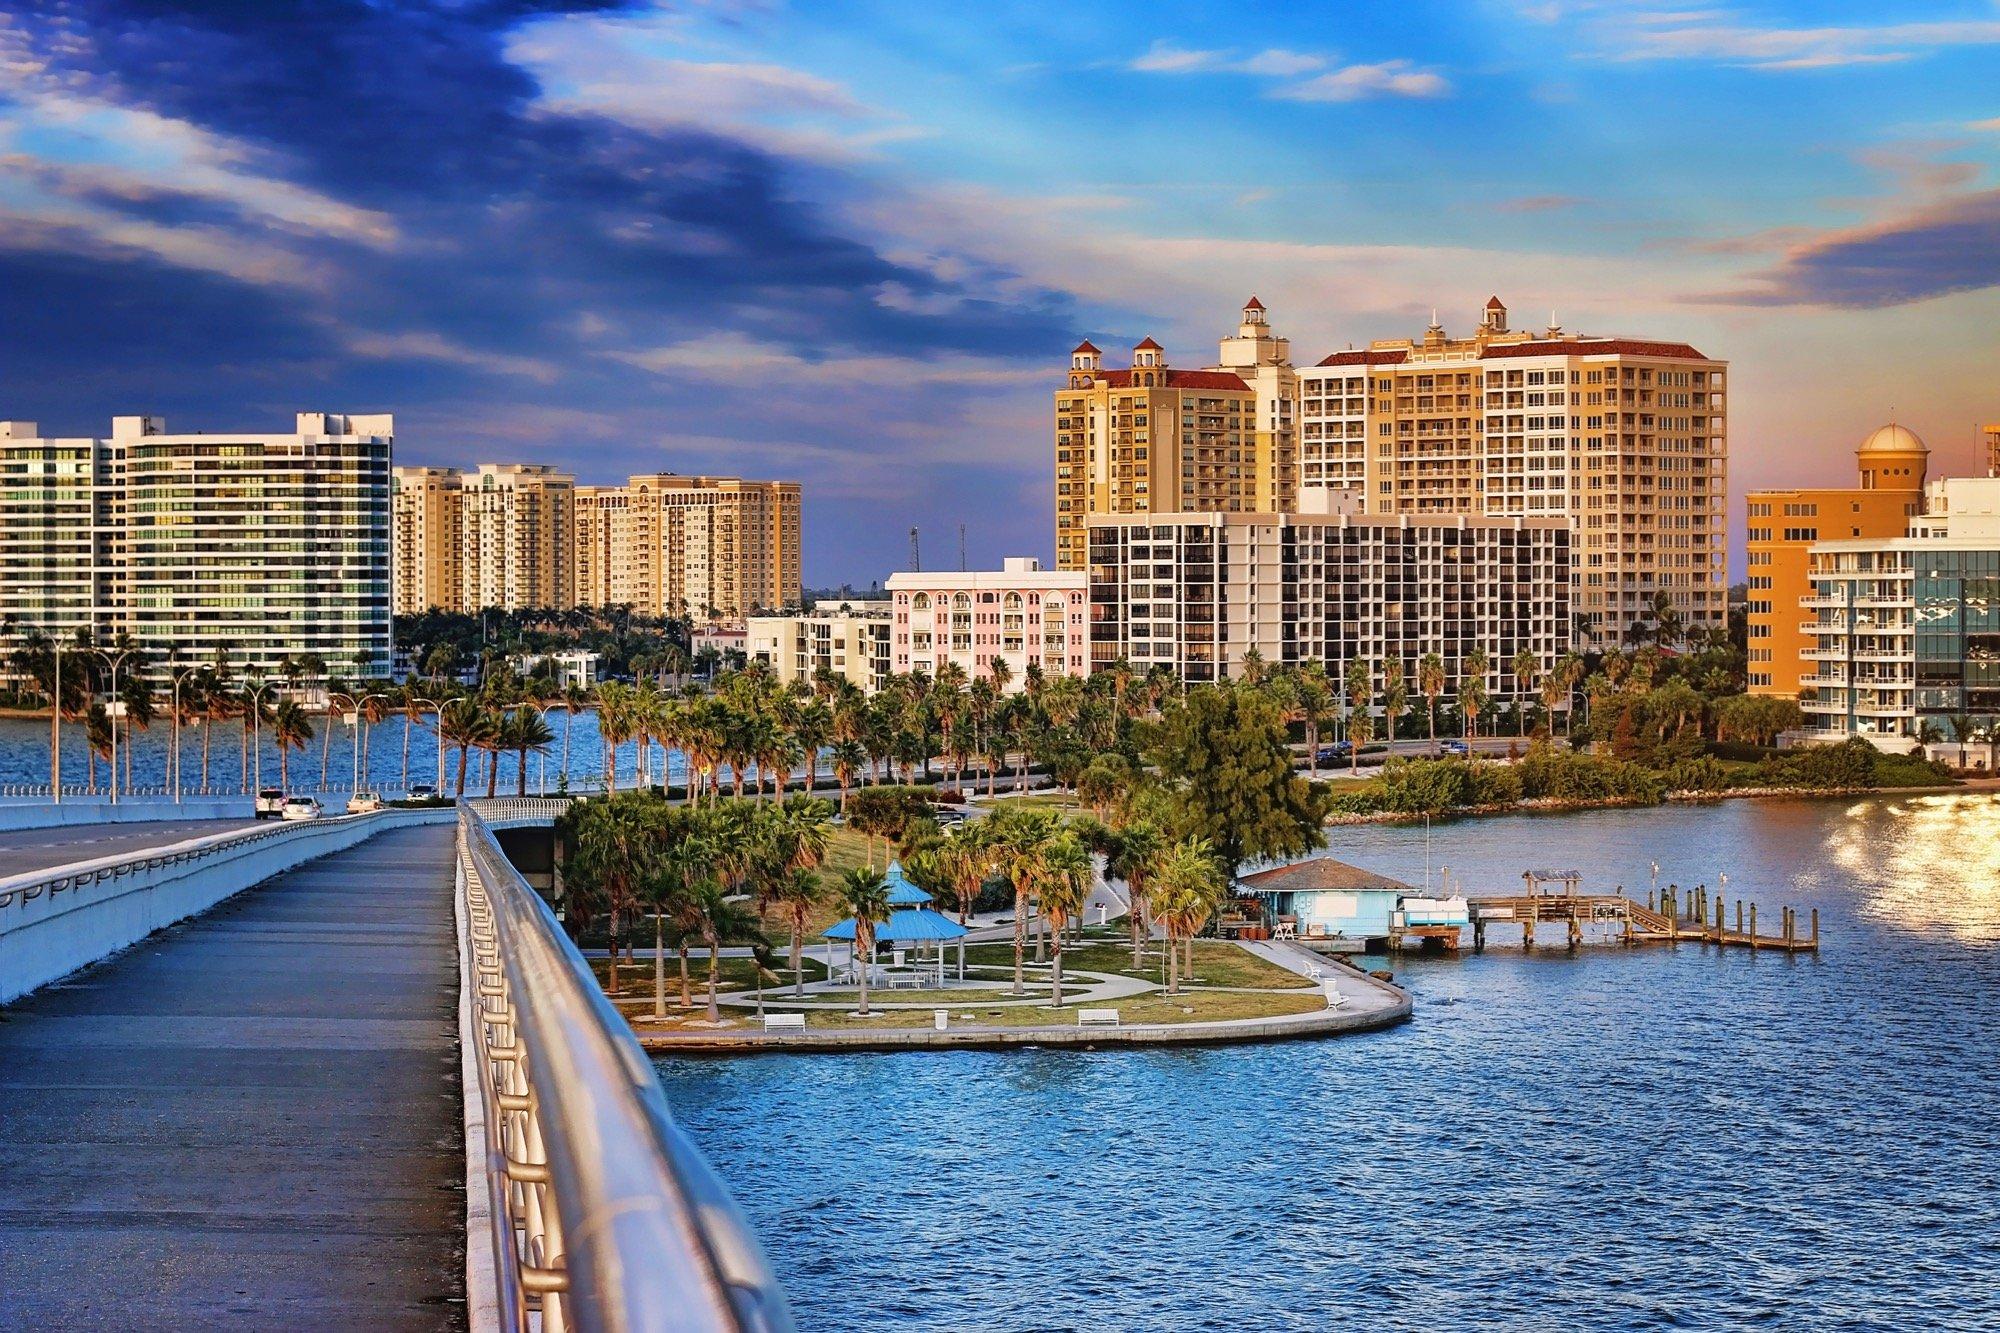 Downtown Sarasota Landscape